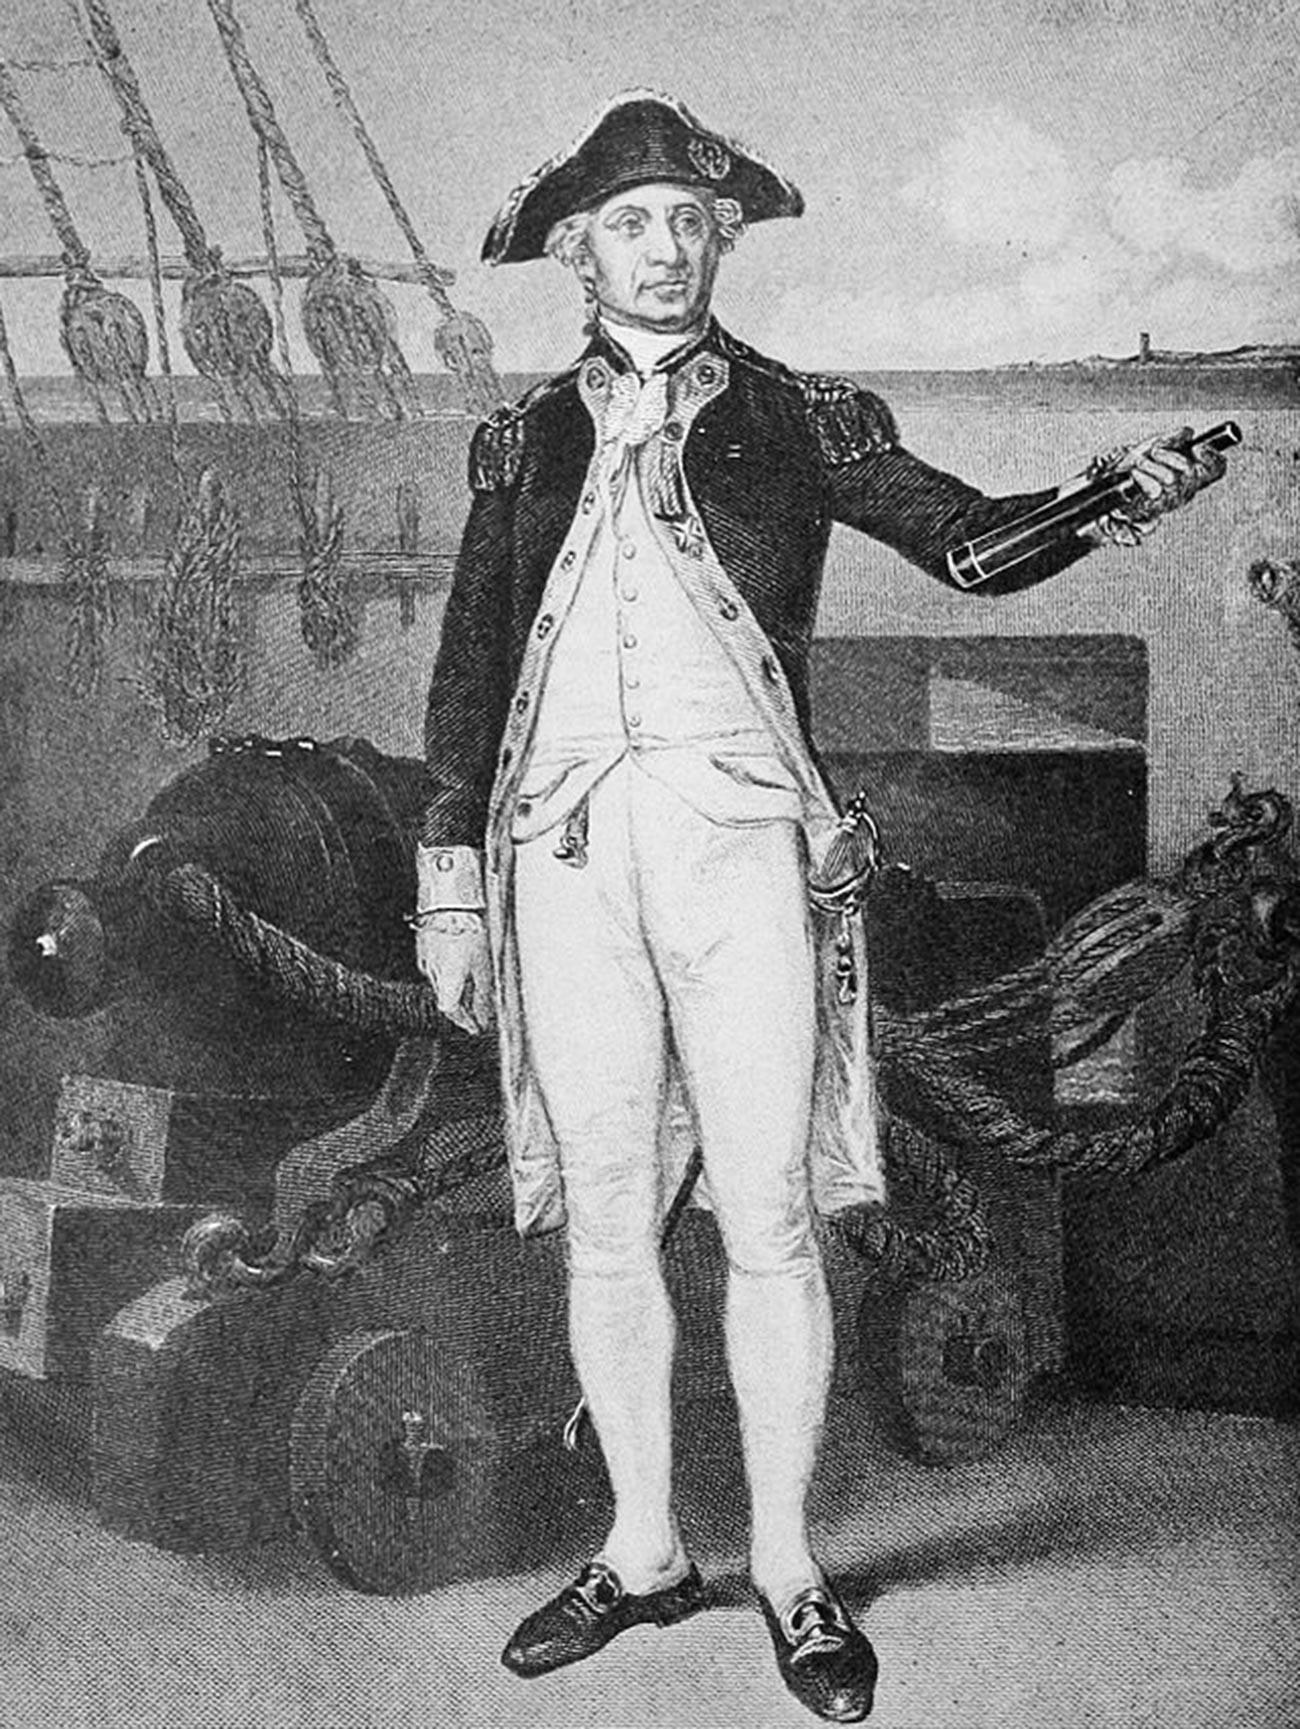 Admiral John Paul Jones